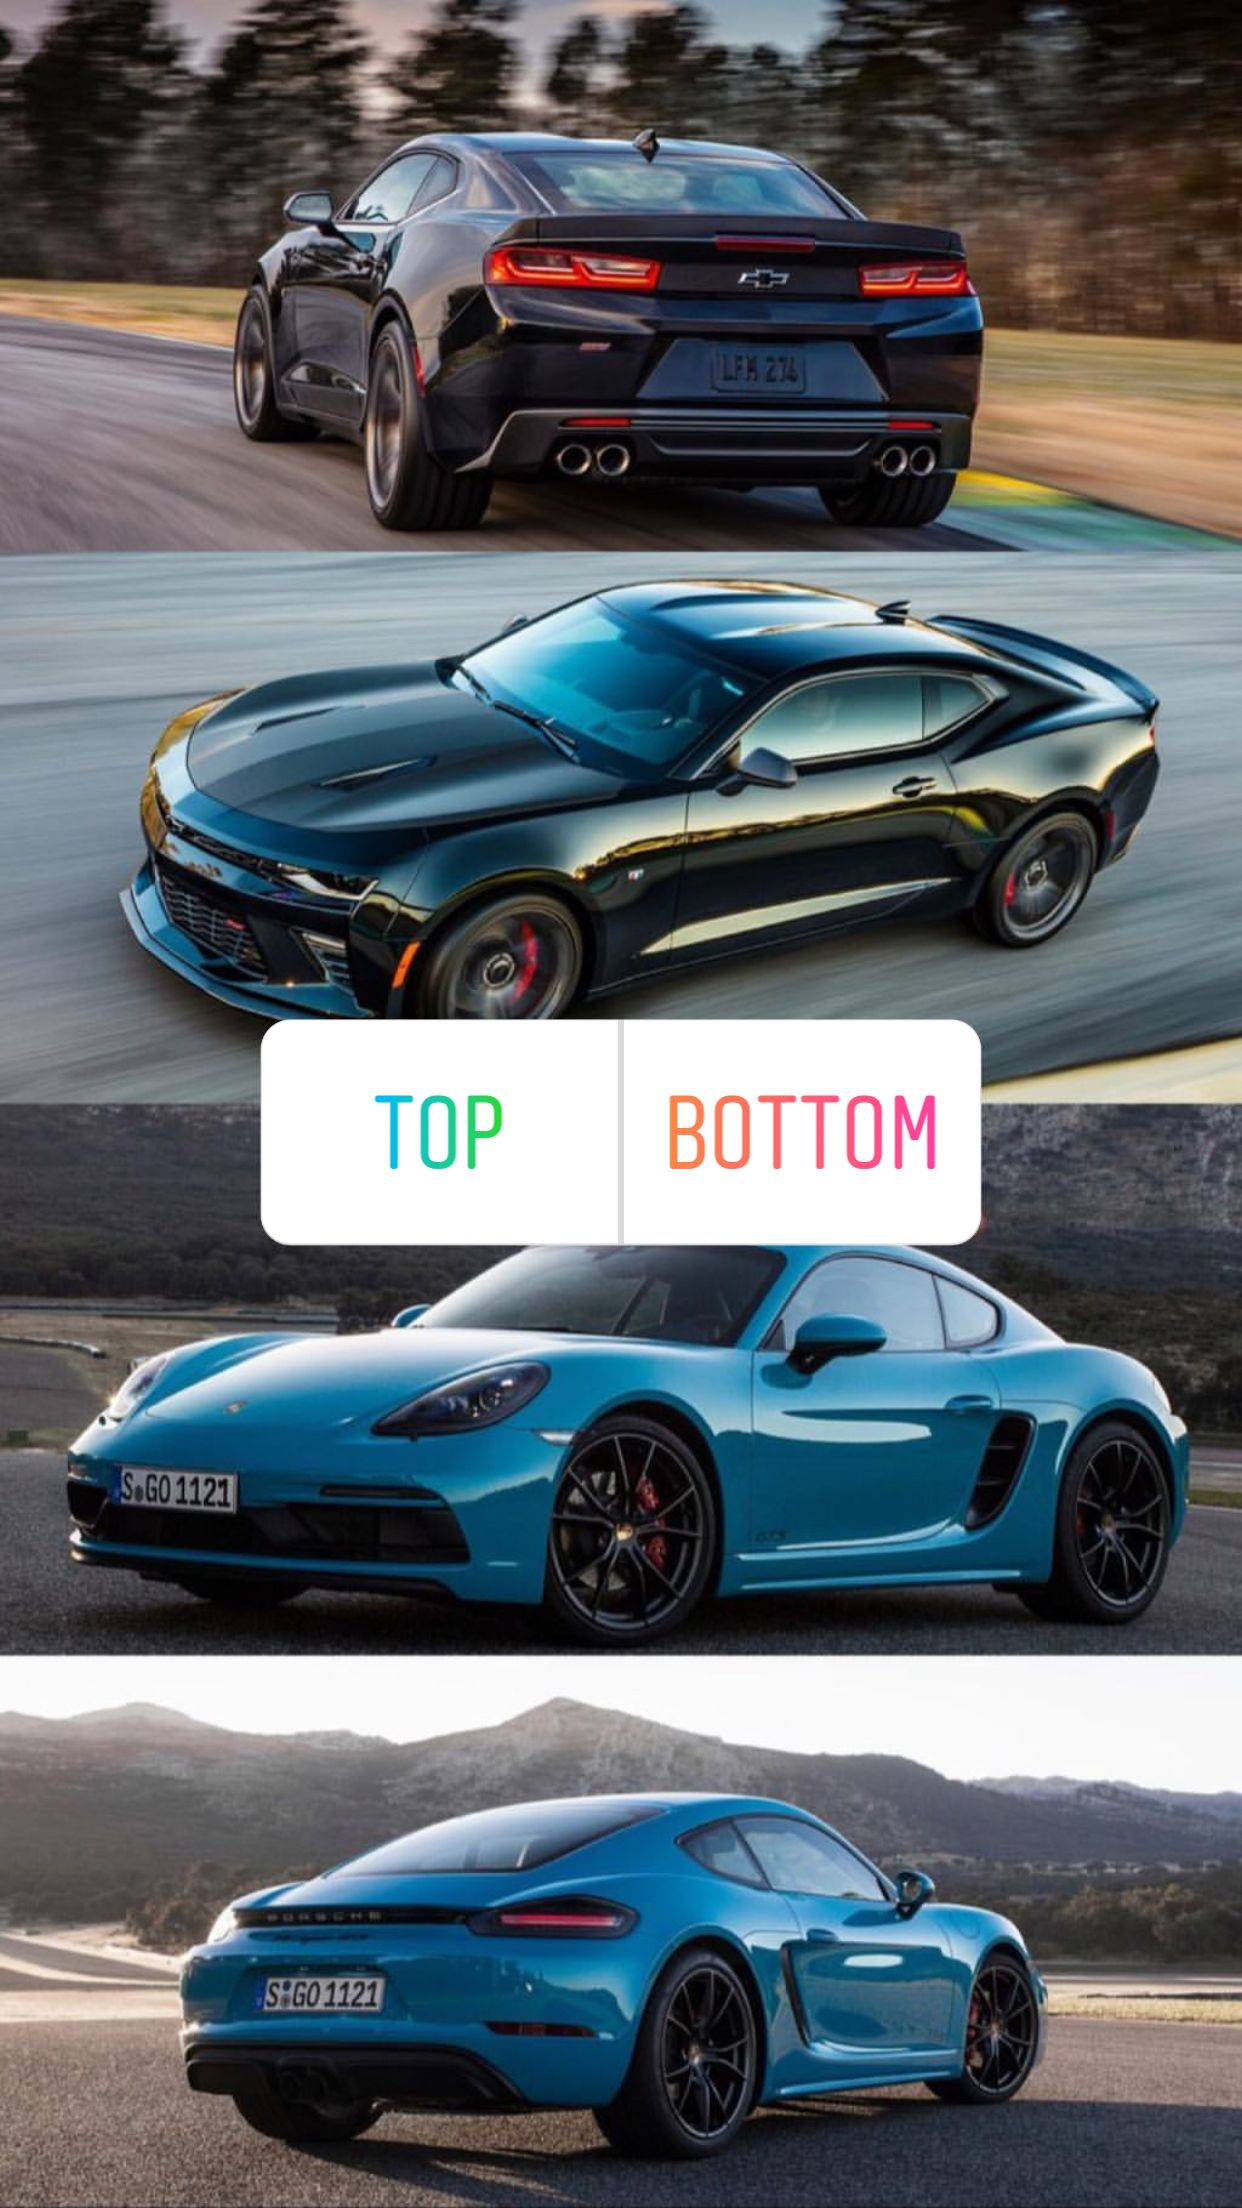 Chevrolet Or Porsche Porsche Super Cars Sports Cars